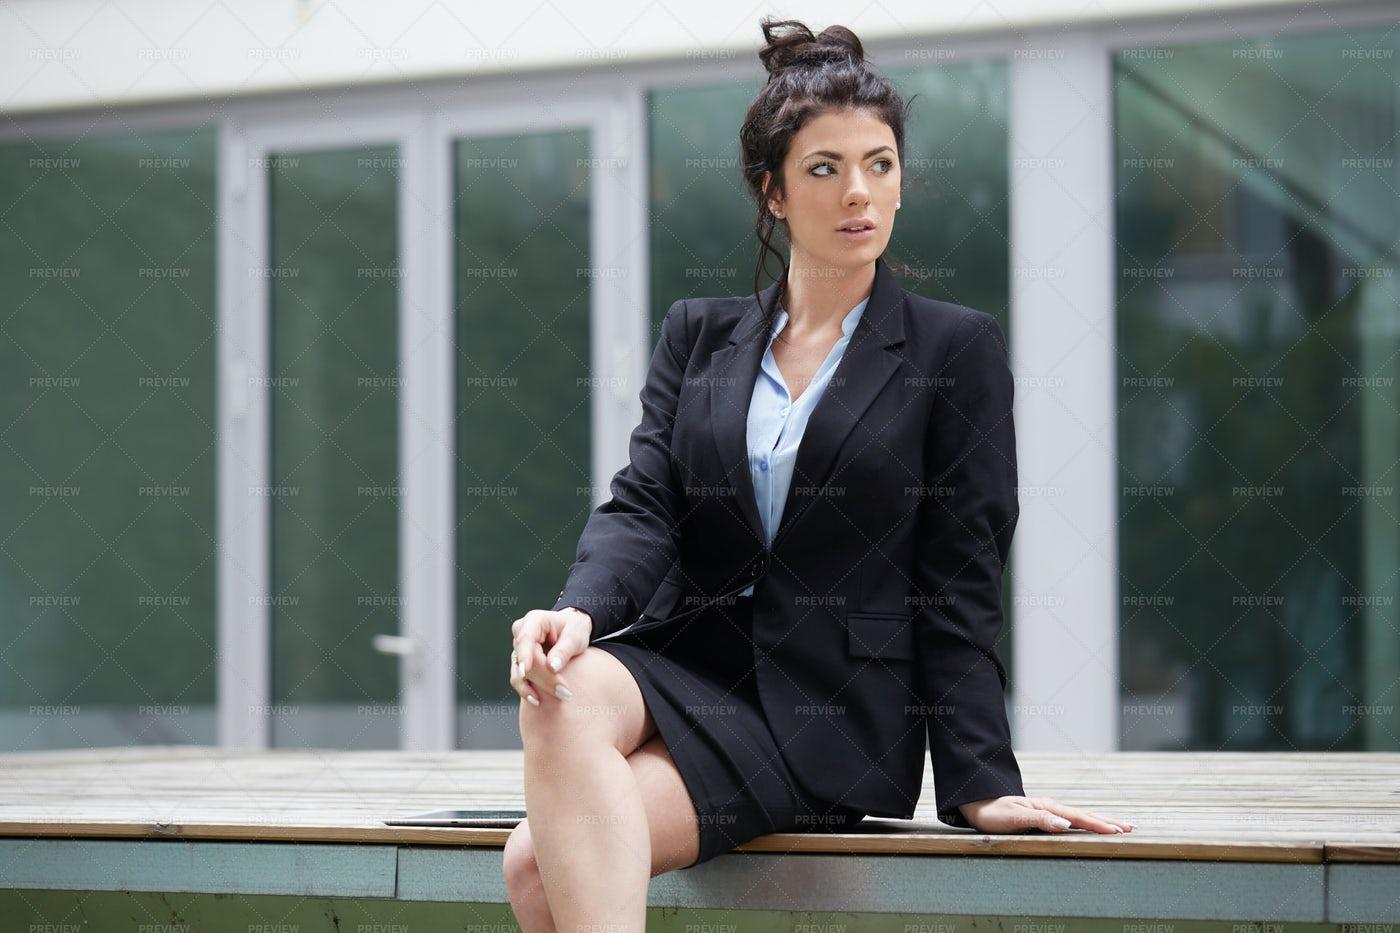 Businesswomen In The Outdoors: Stock Photos